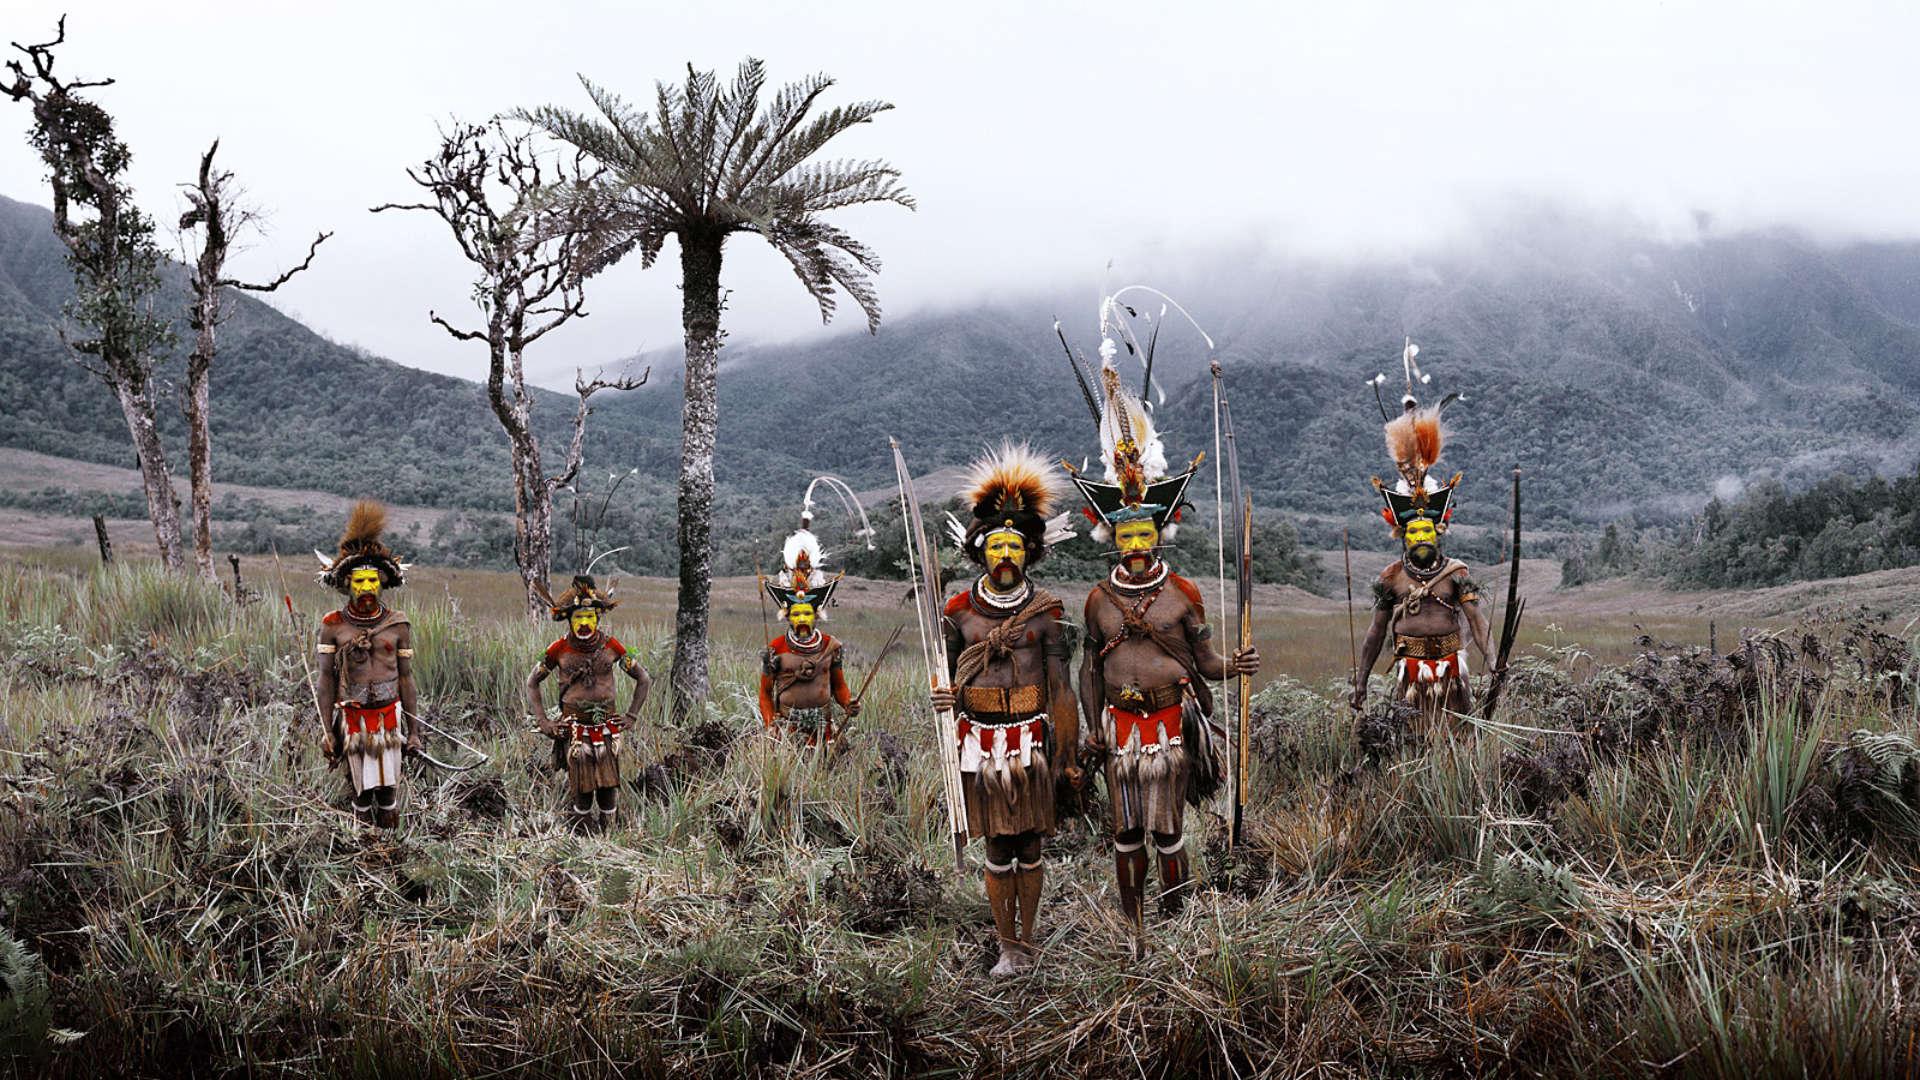 Huli stam, Tari vallei, Papoea-Nieuw-Guinea